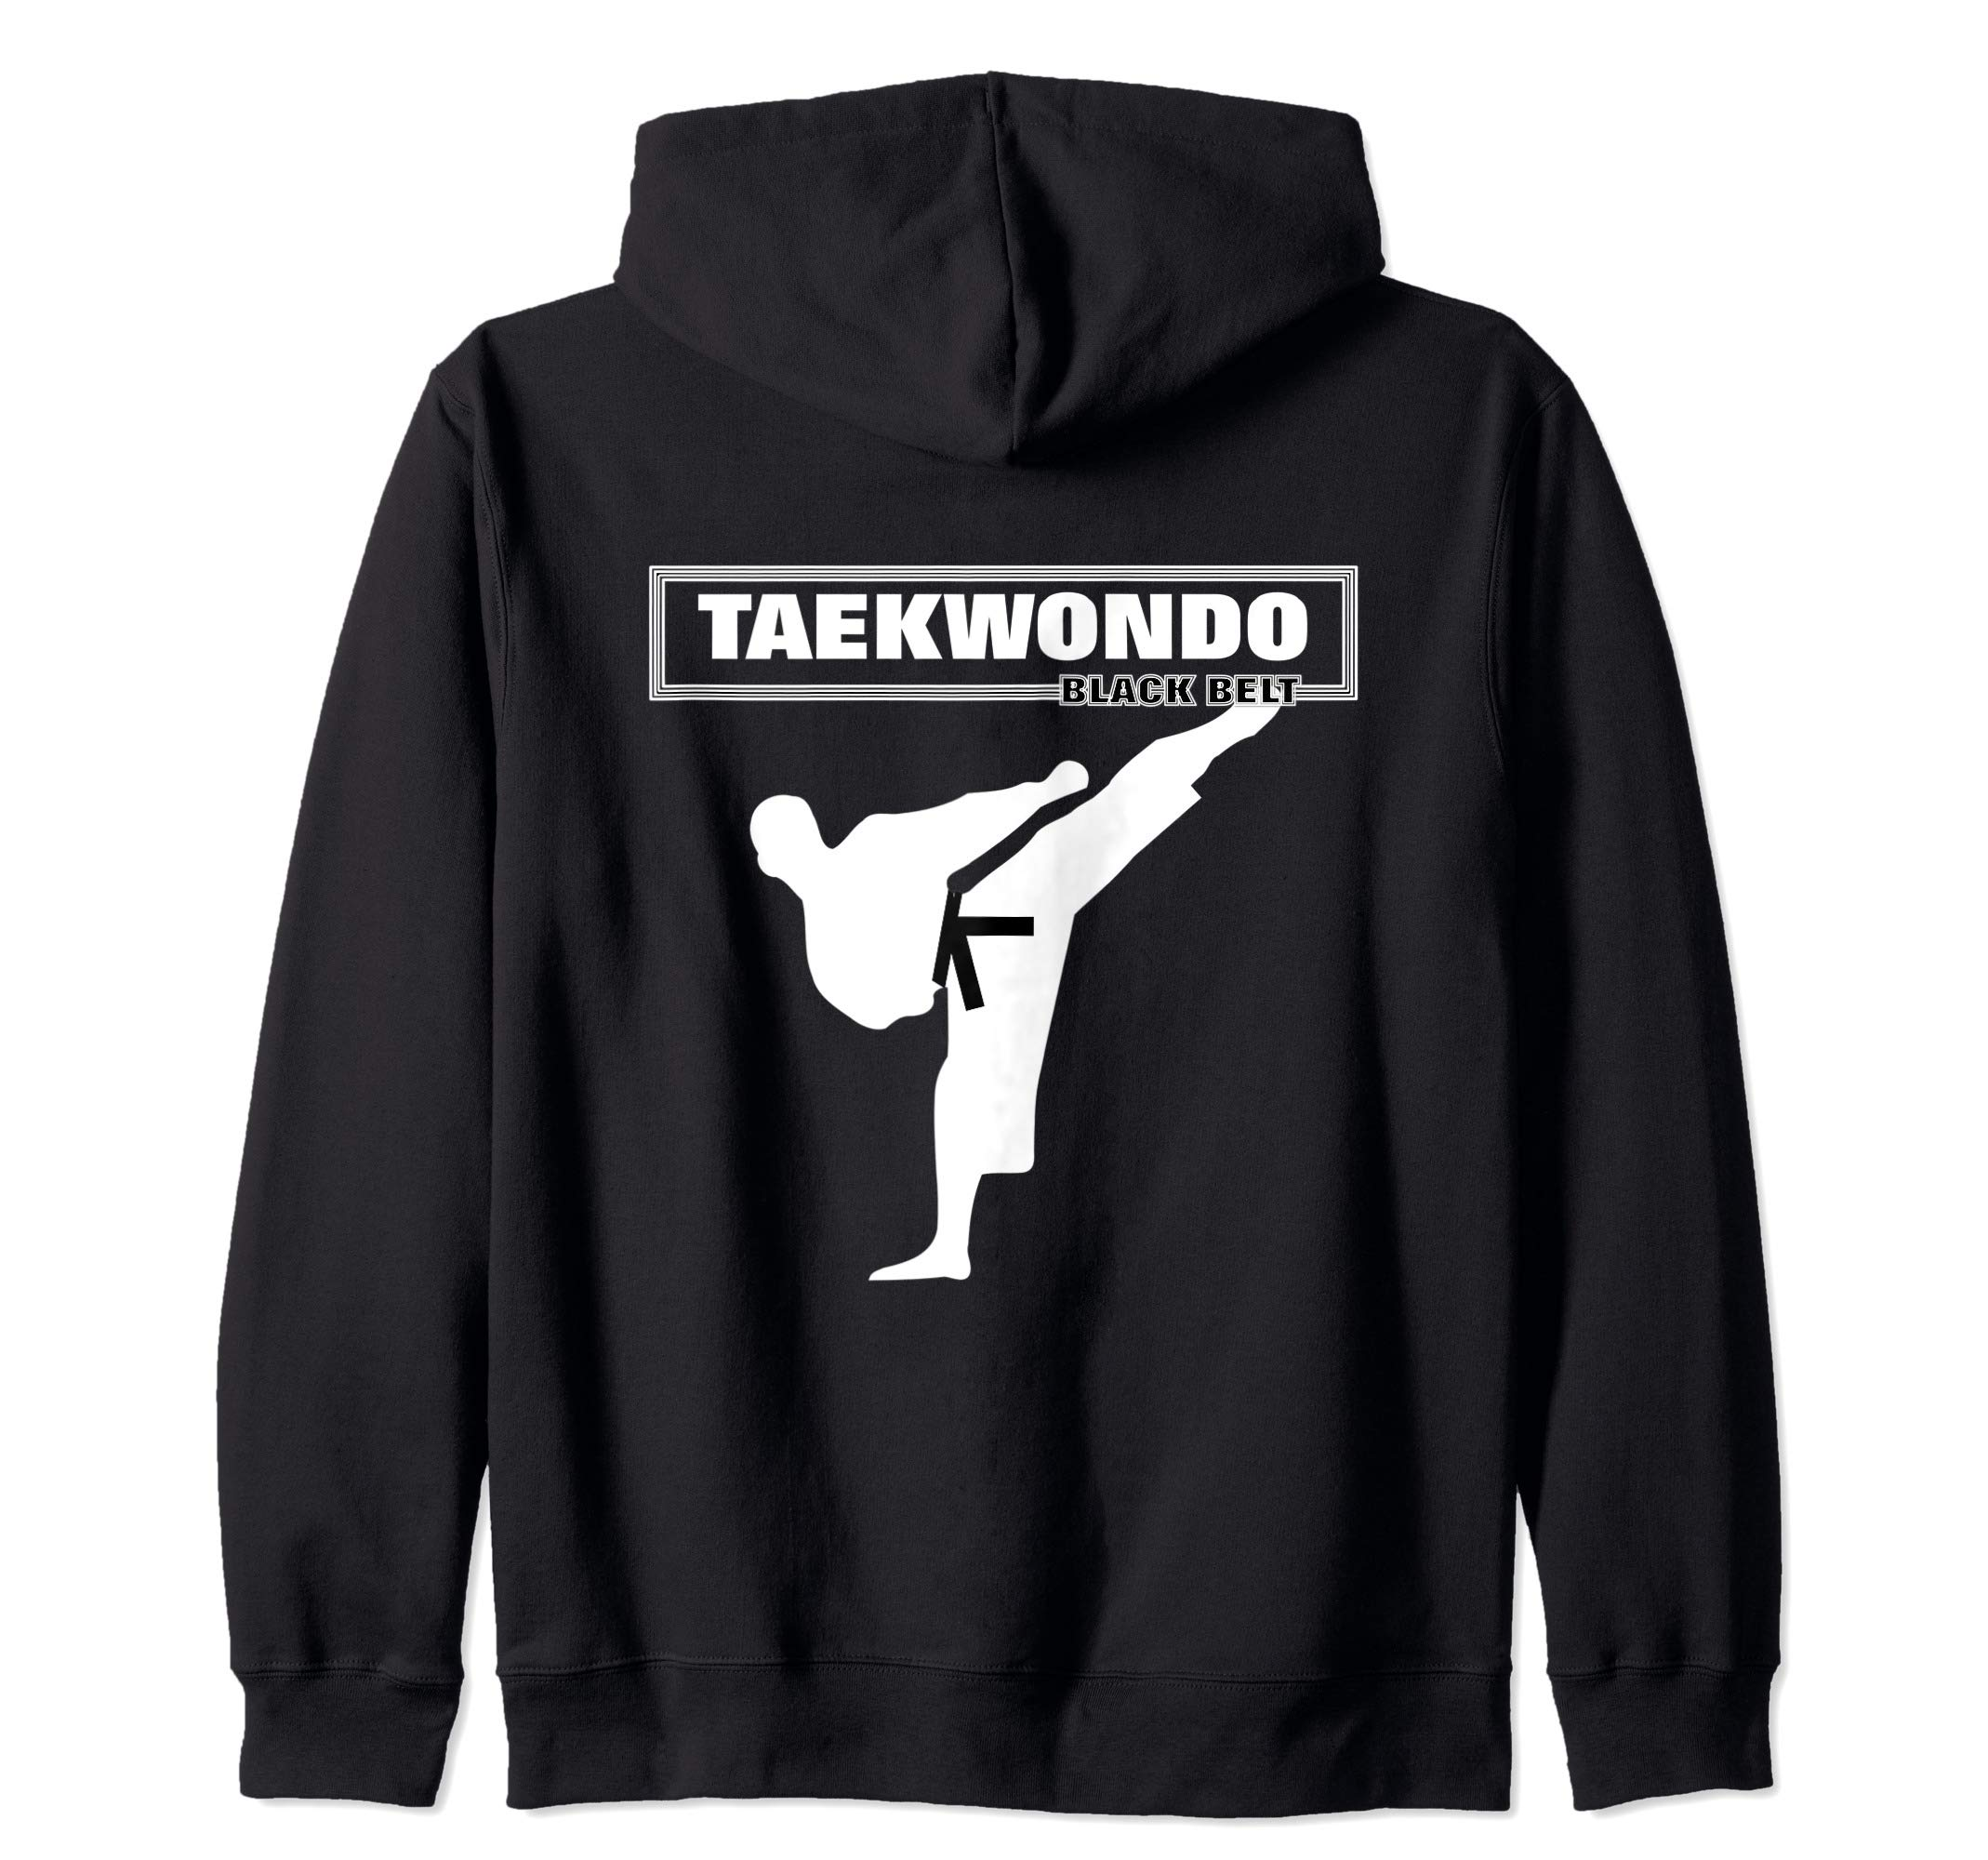 Taekwondo Martial Arts Black Belt  Zip Hoodie by Hasharon Taekwondo Martial Arts